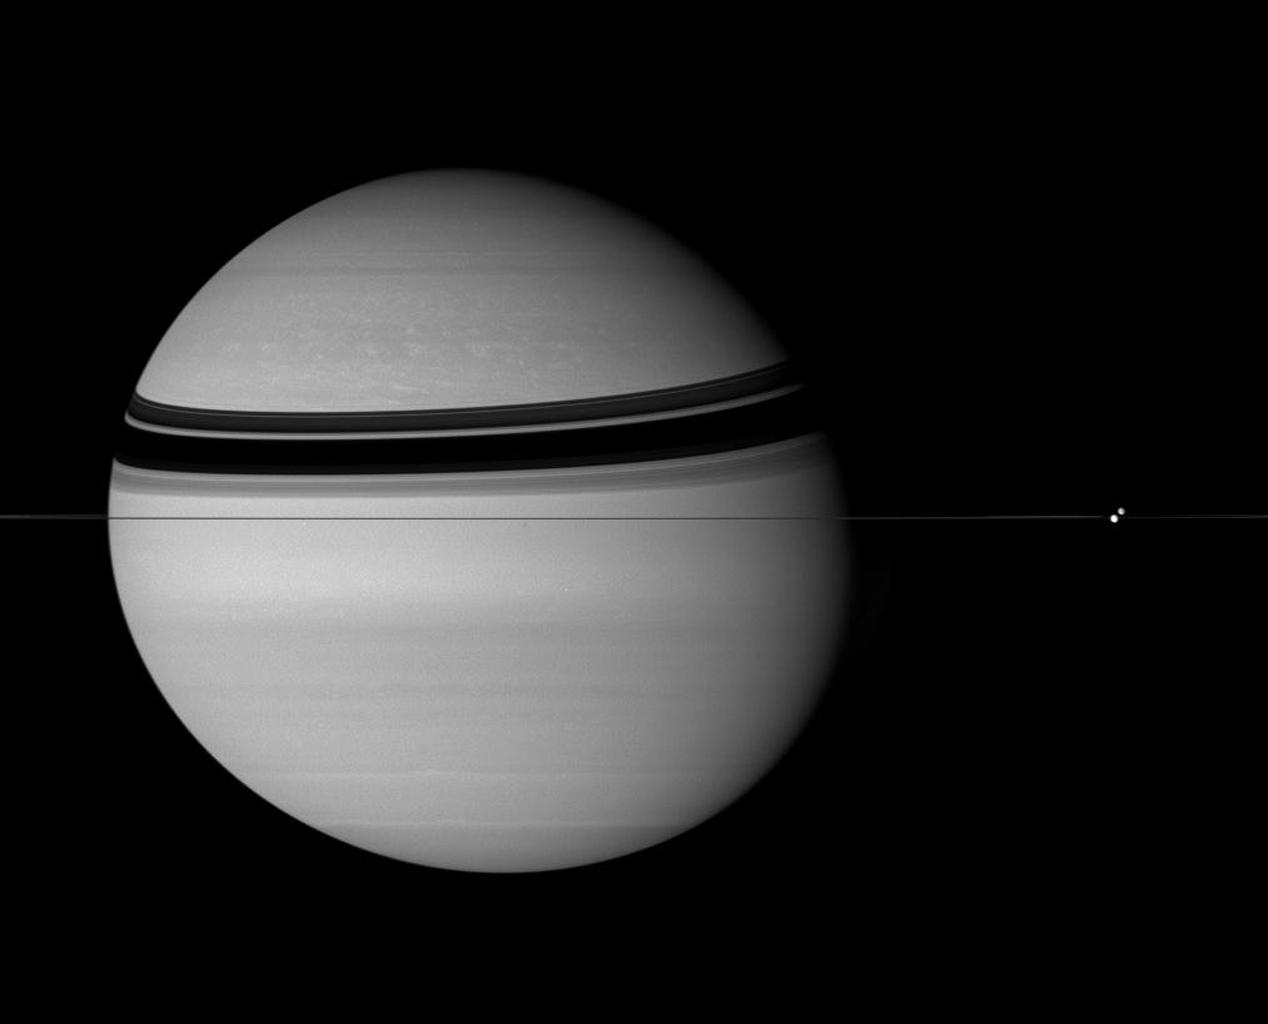 jovian nasas cassini spacecraft - HD1268×1024